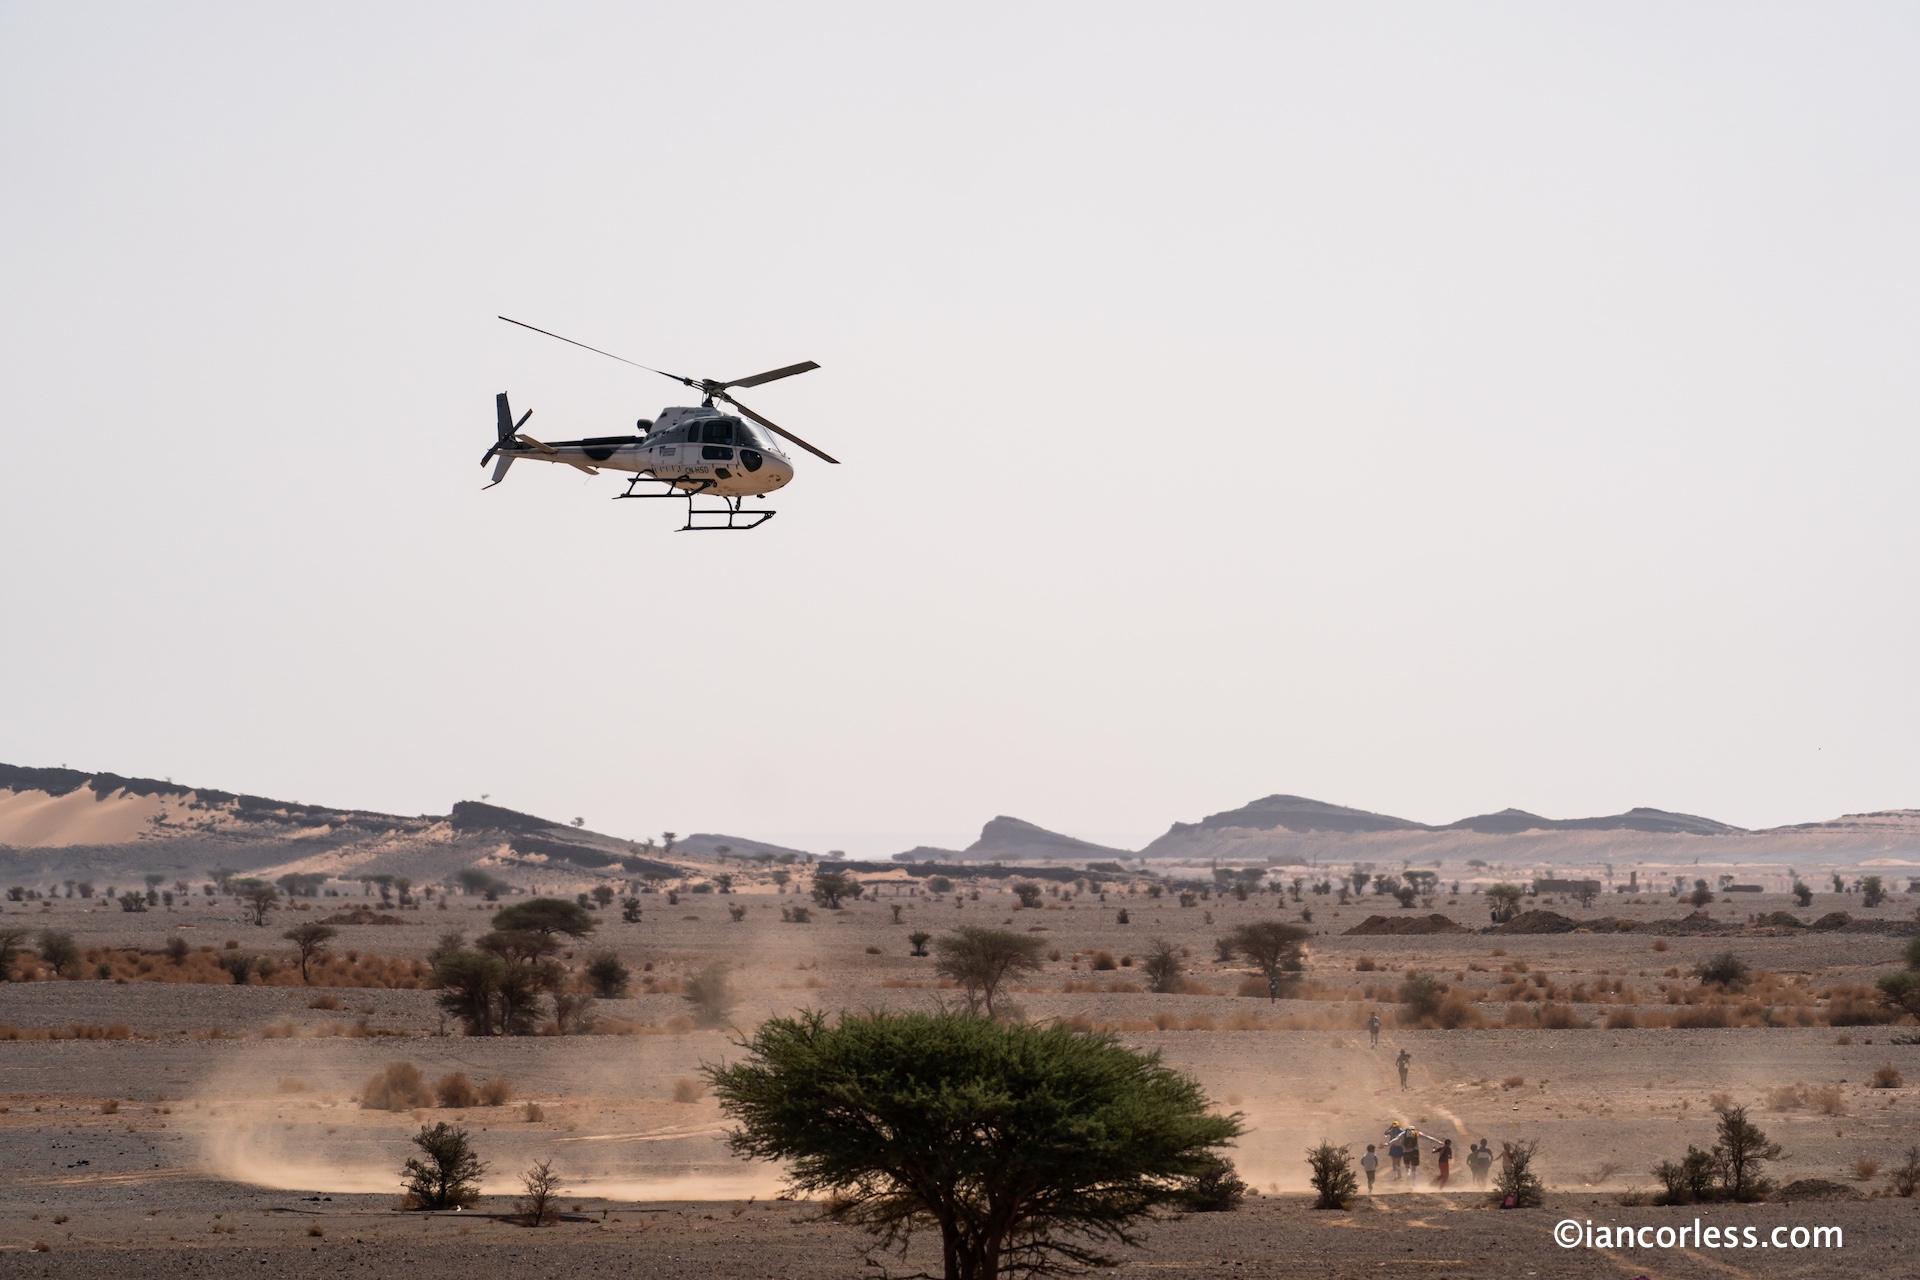 Marathon des sables helicopter